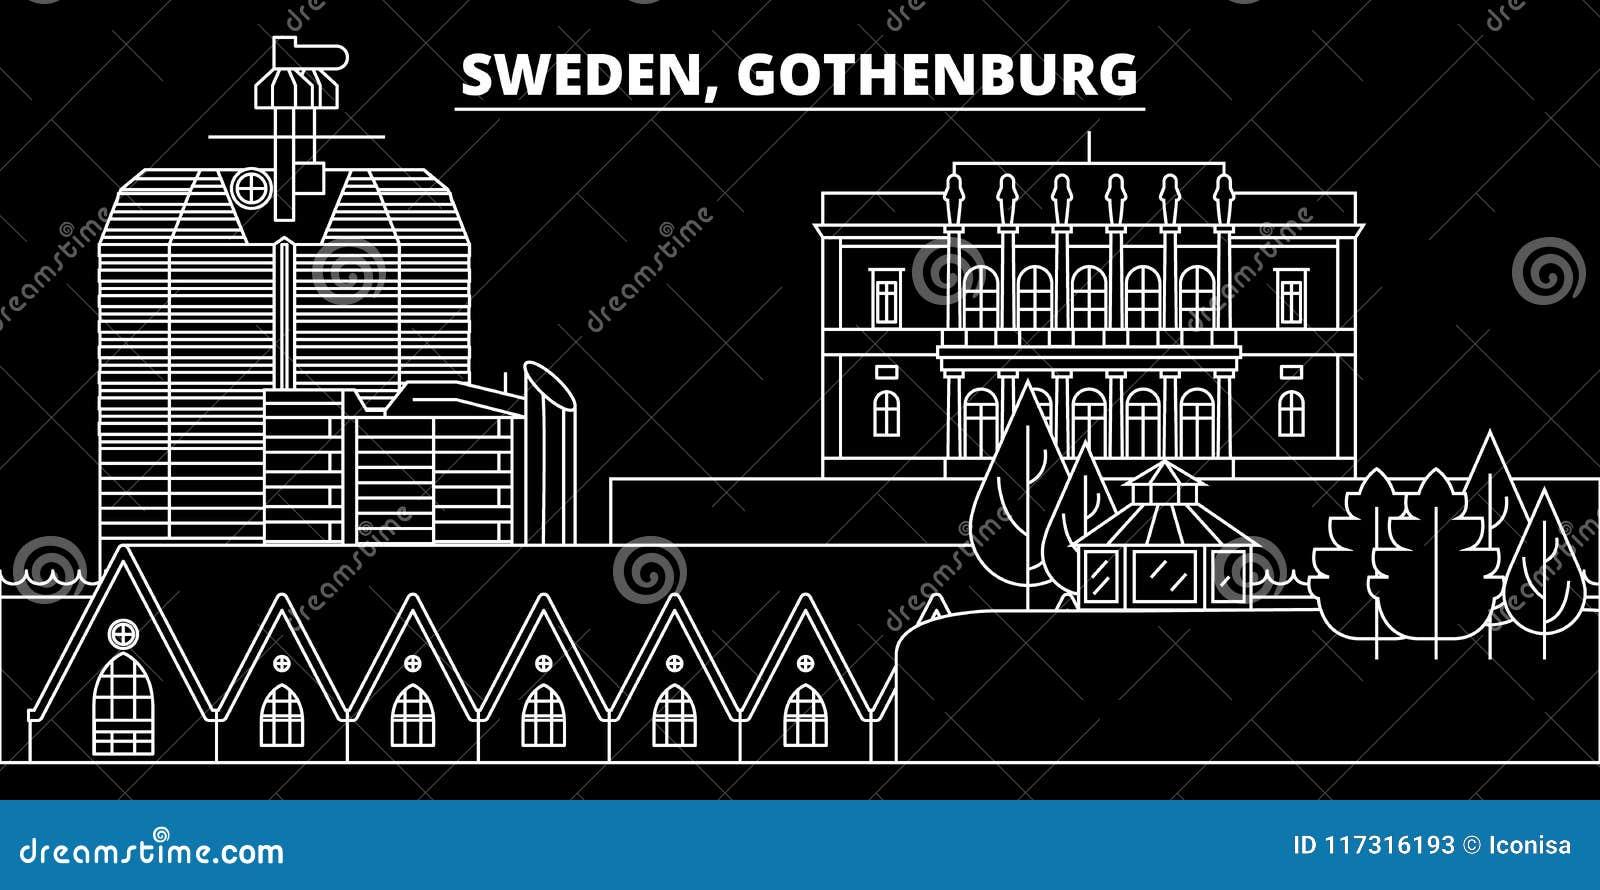 Redigerbar Karta Sverige.Goteborg Konturhorisont Sverige Goteborg Vektorstad Svensk Linjar